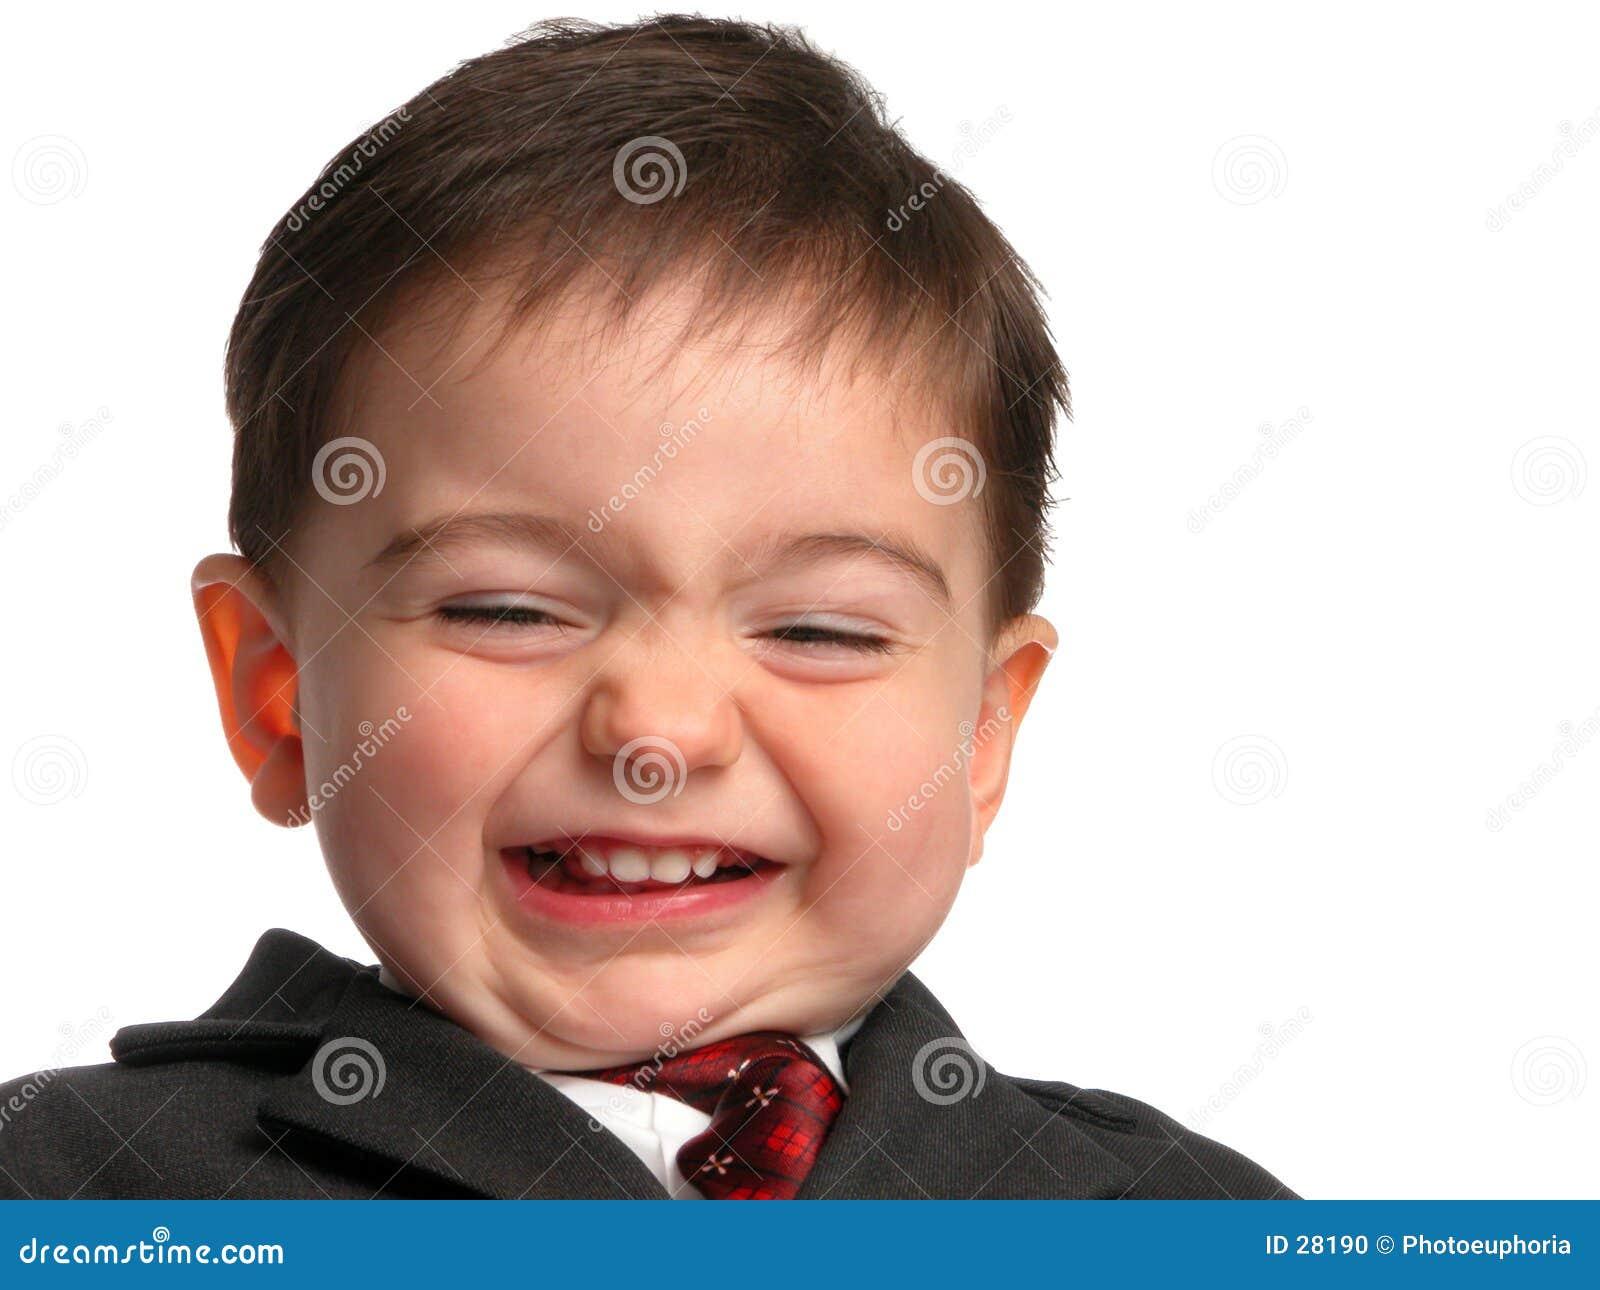 Little Man Series: Sour Pickle Smile